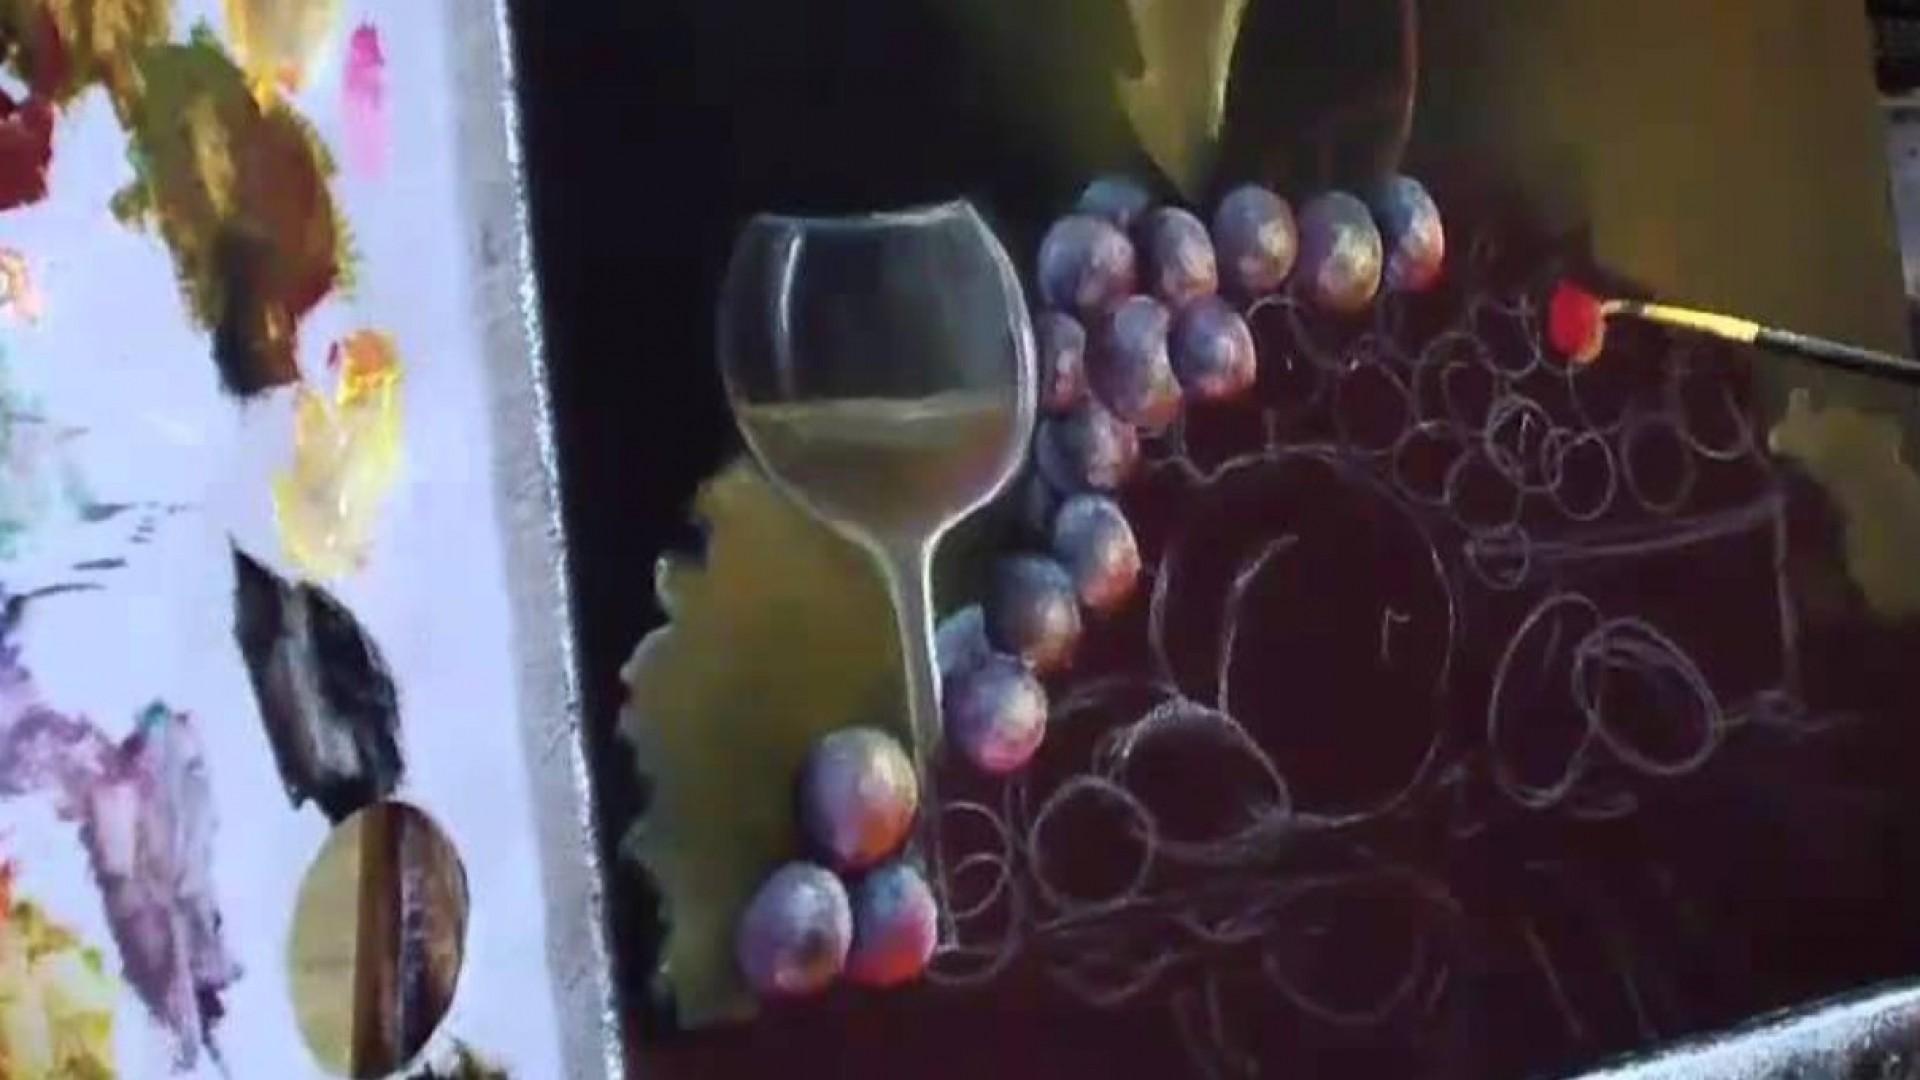 Мастер-класс по живописи: пишем виноград (3 и 4 части)